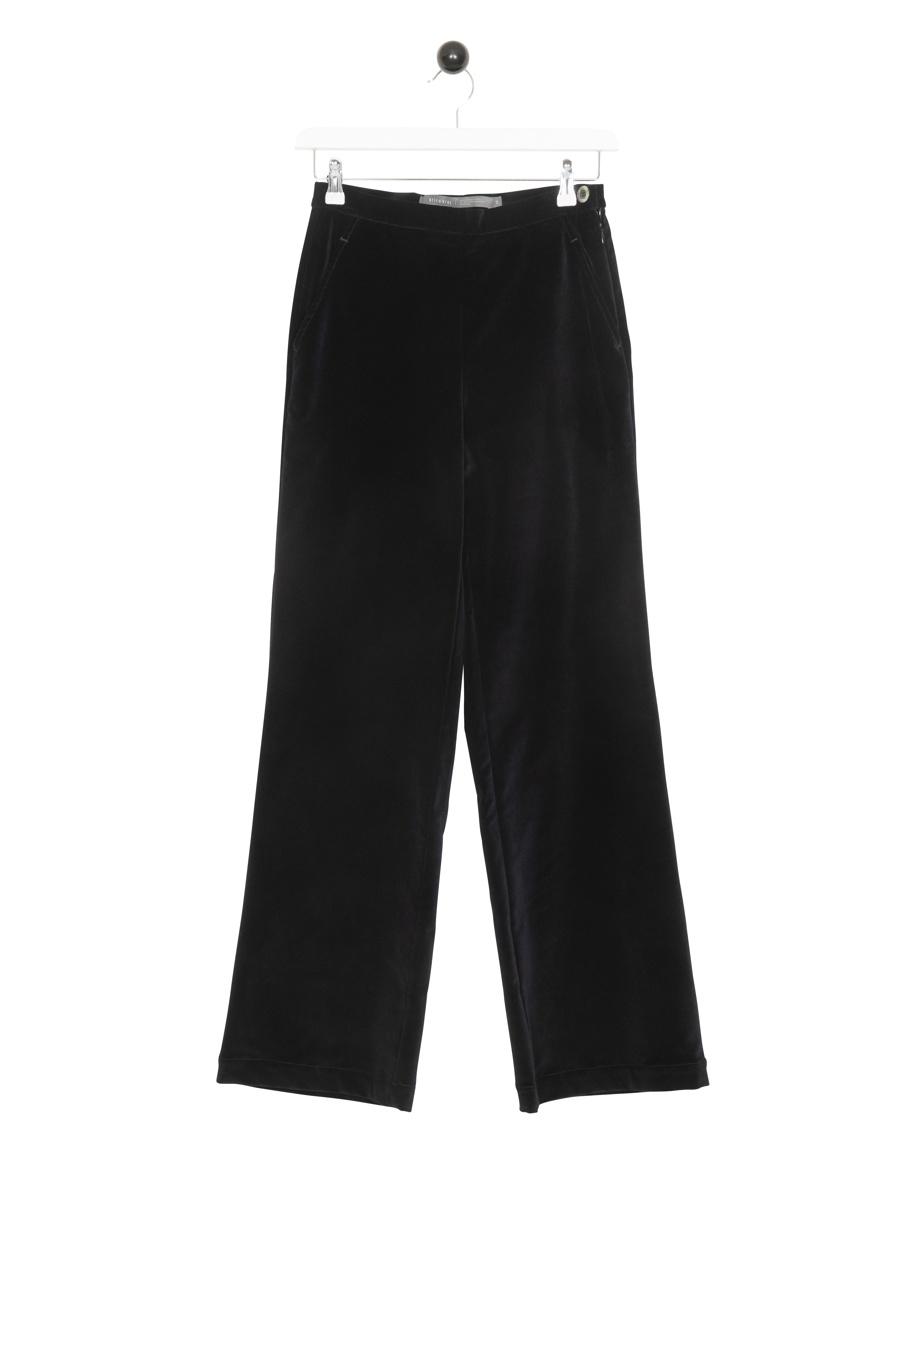 Return Shian Trousers W